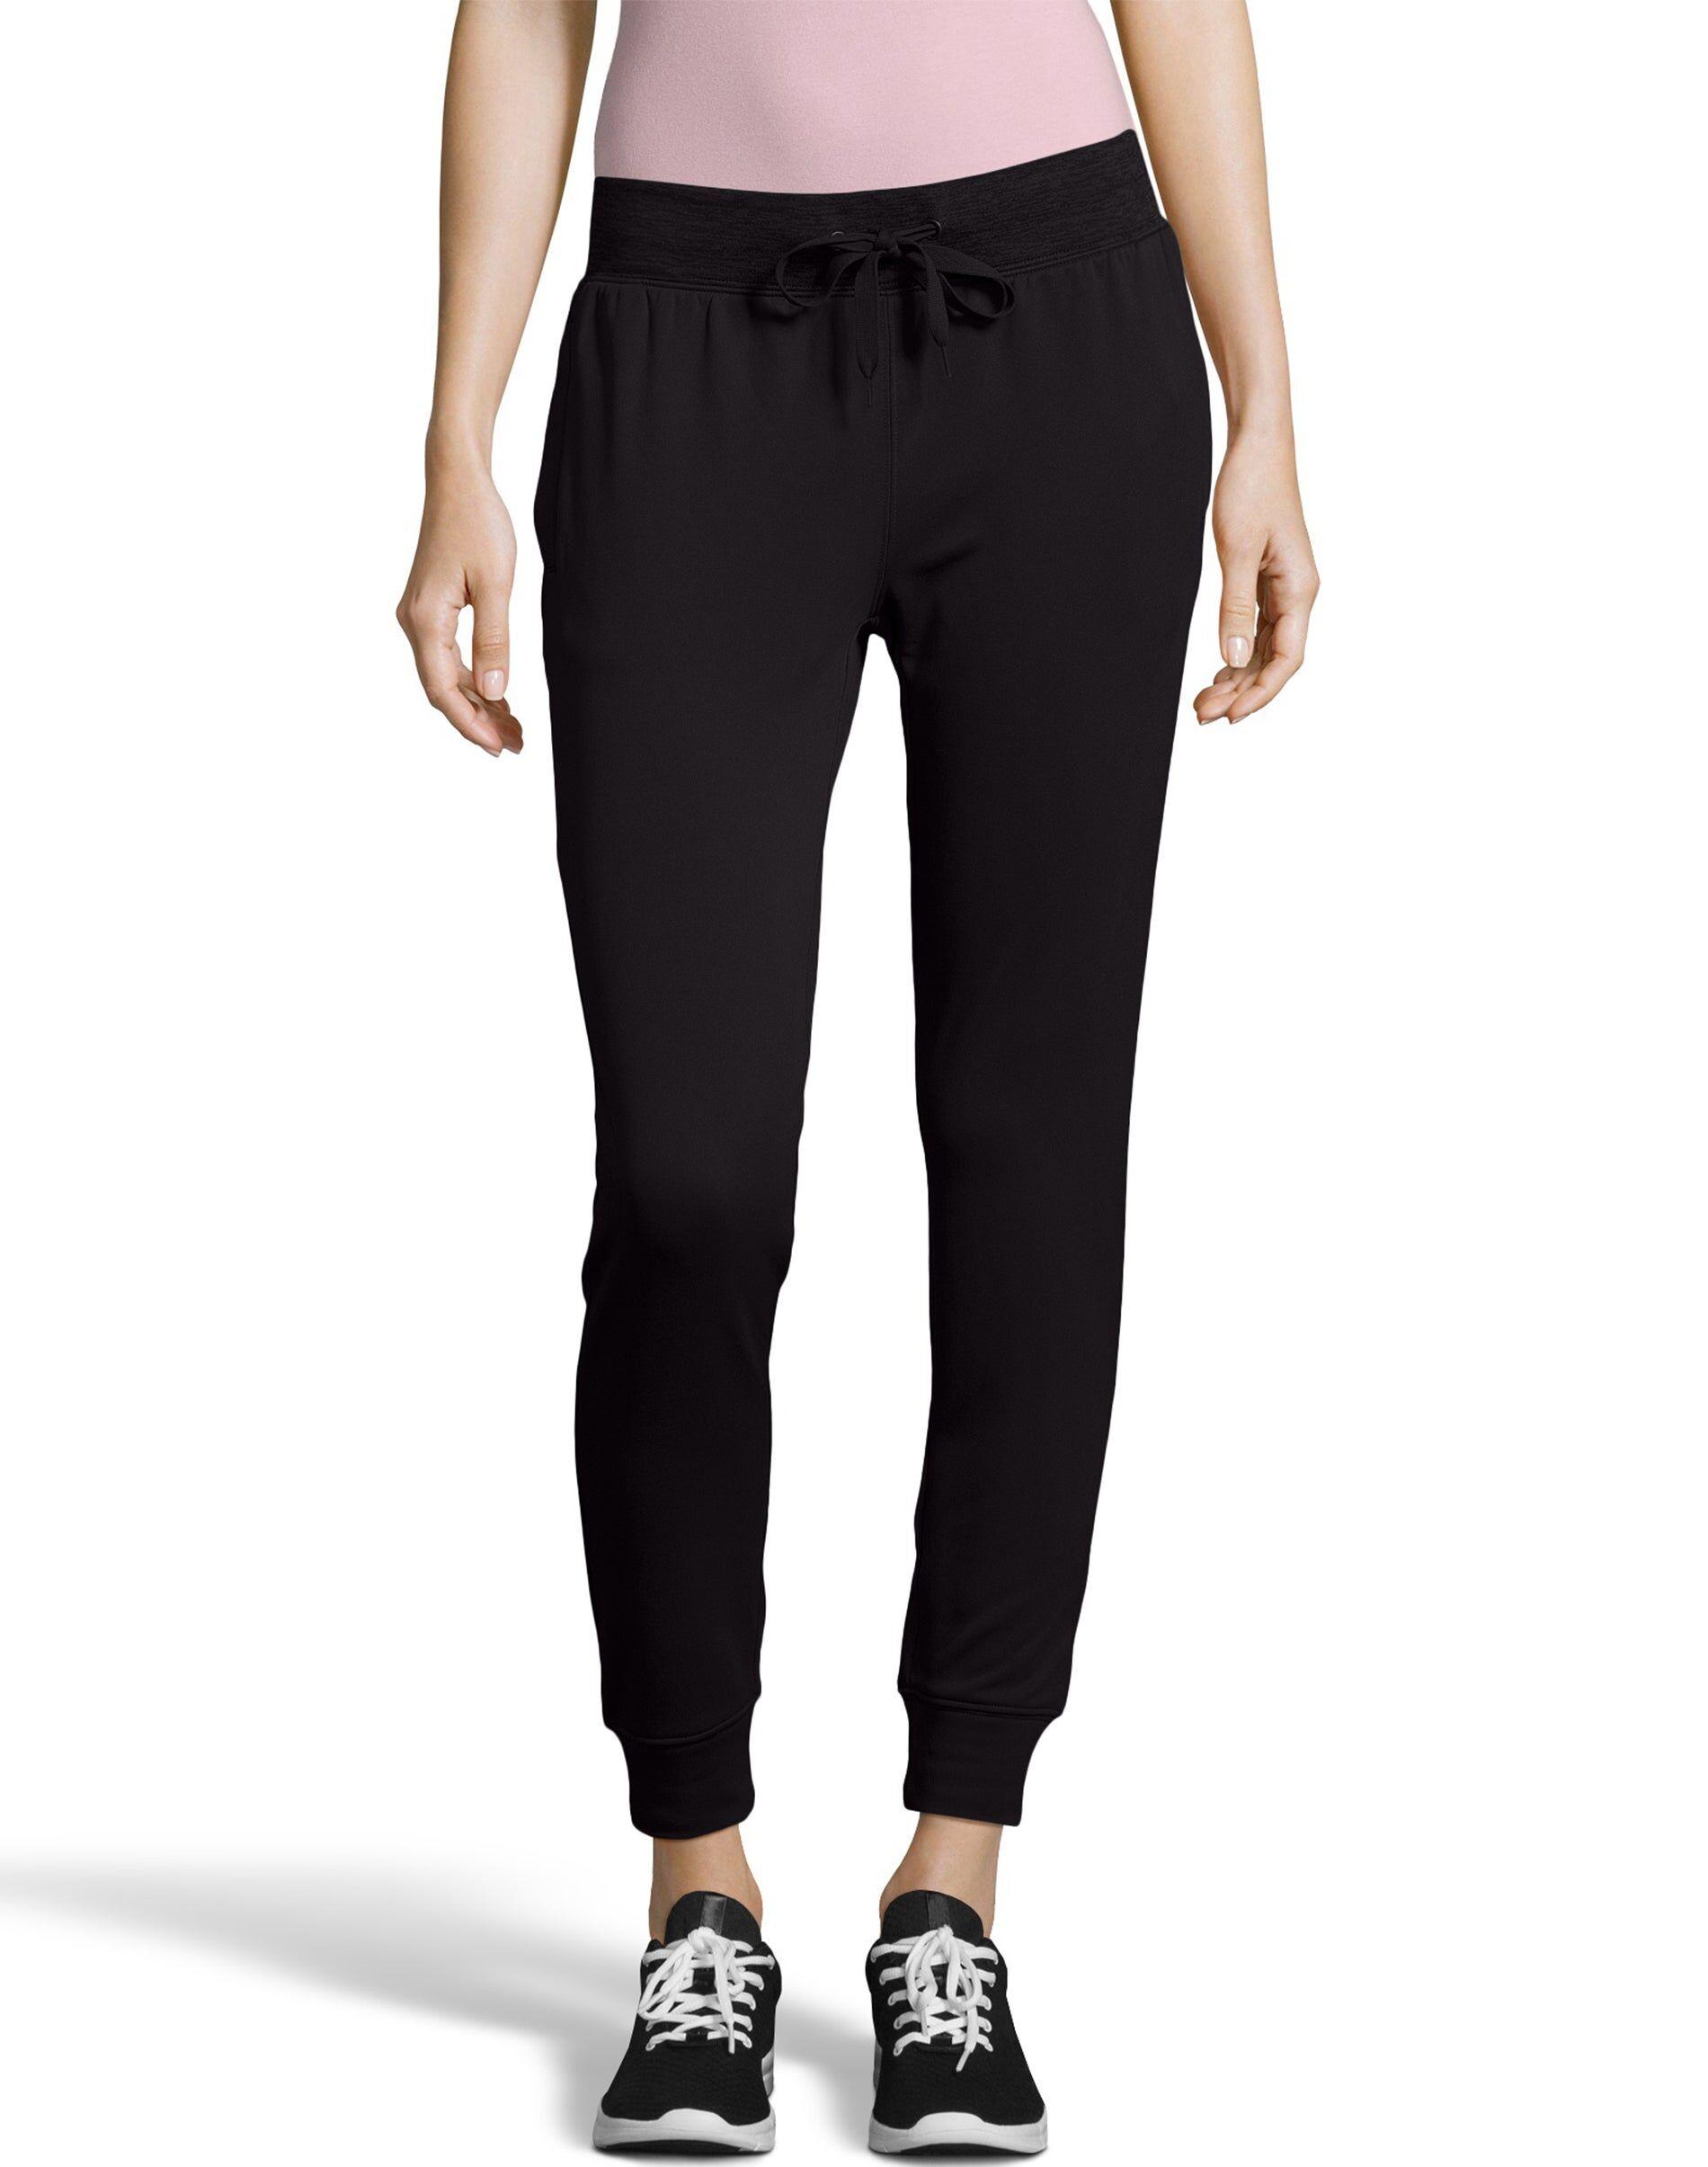 Hanes Sport Women's Performance Fleece Jogger Pants With Pockets Black/Black Heather XL